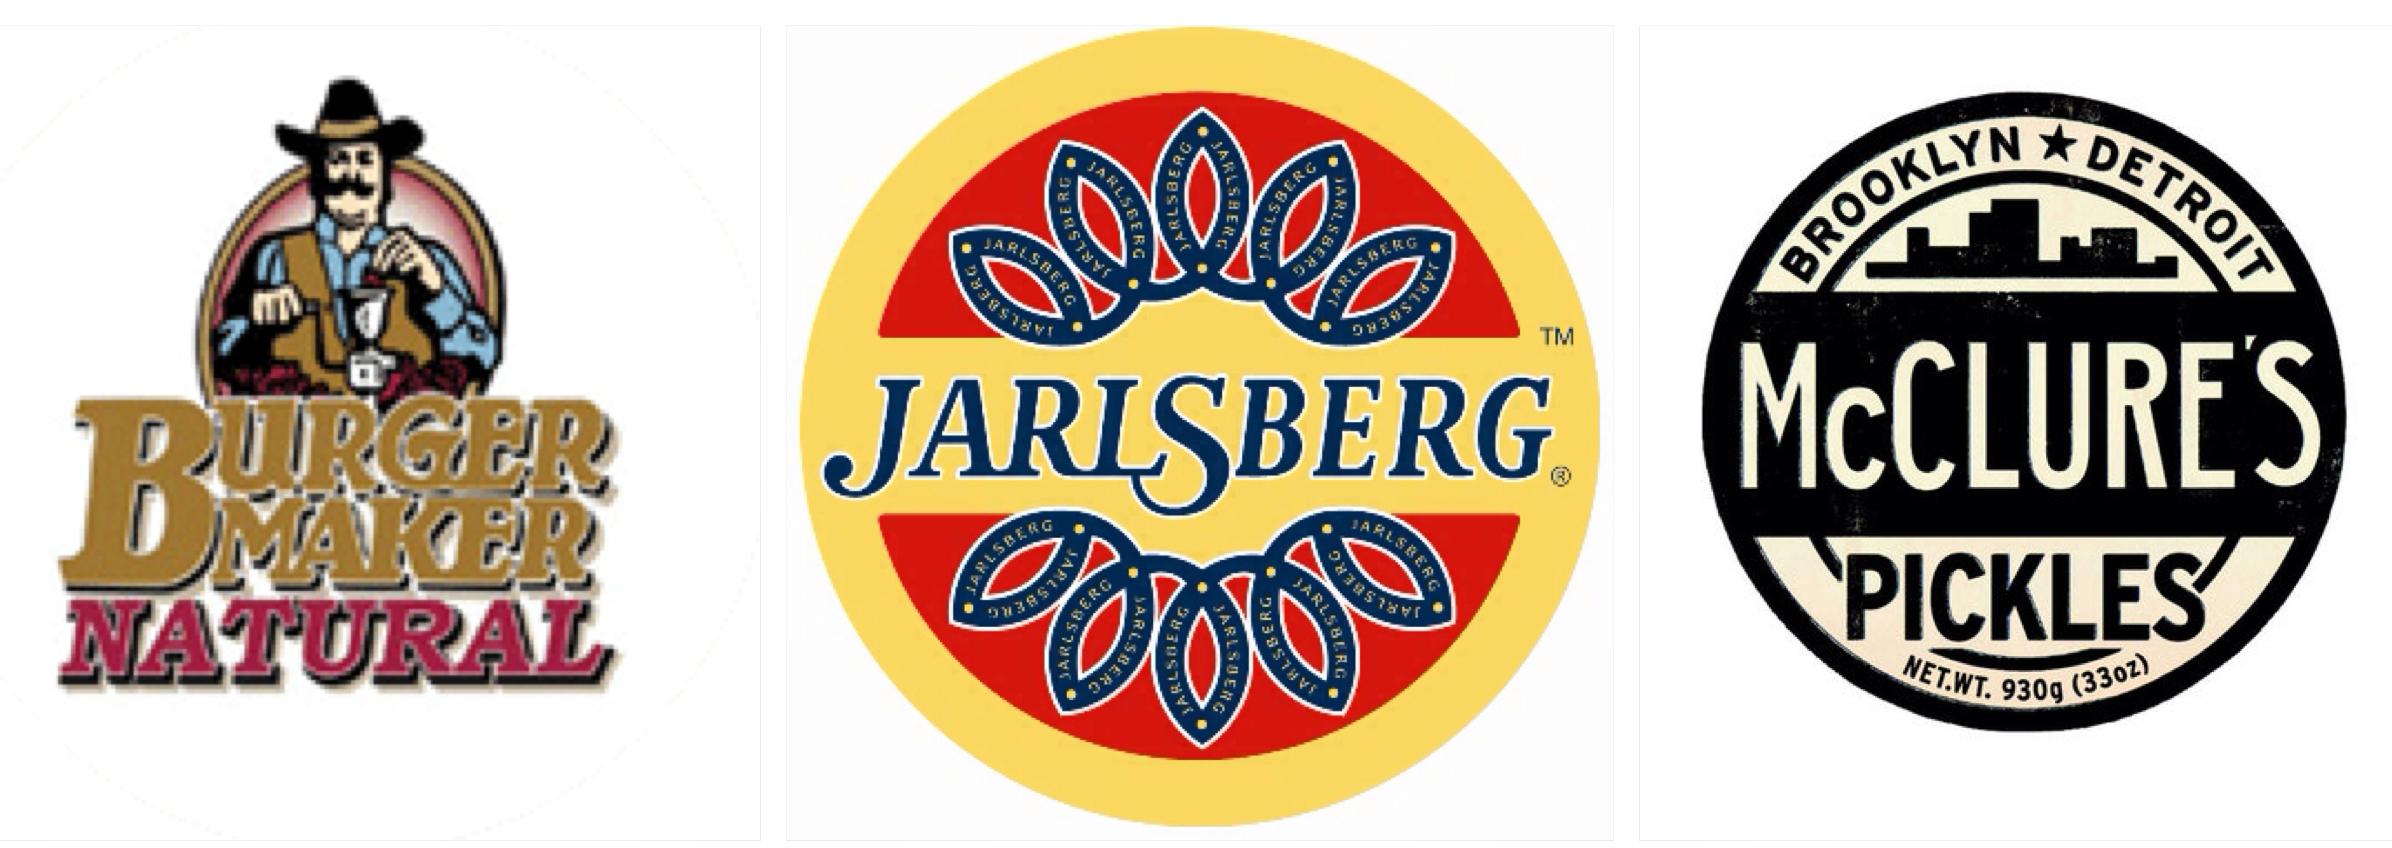 Burger Maker Jarlsberg McLures